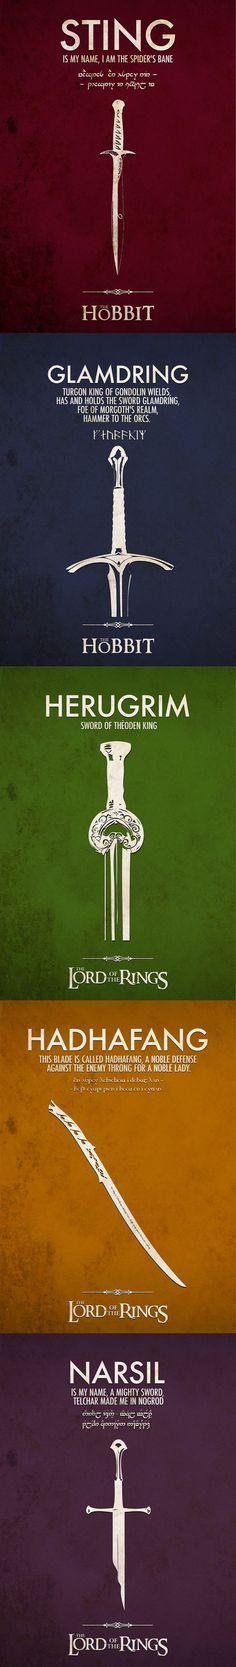 Middle-Earth Swords ~ Hobbit/Lord of the Rings Legolas, Gandalf, Aragorn, Thranduil, Jrr Tolkien, Tolkien Books, The Middle, Middle Earth, Narnia